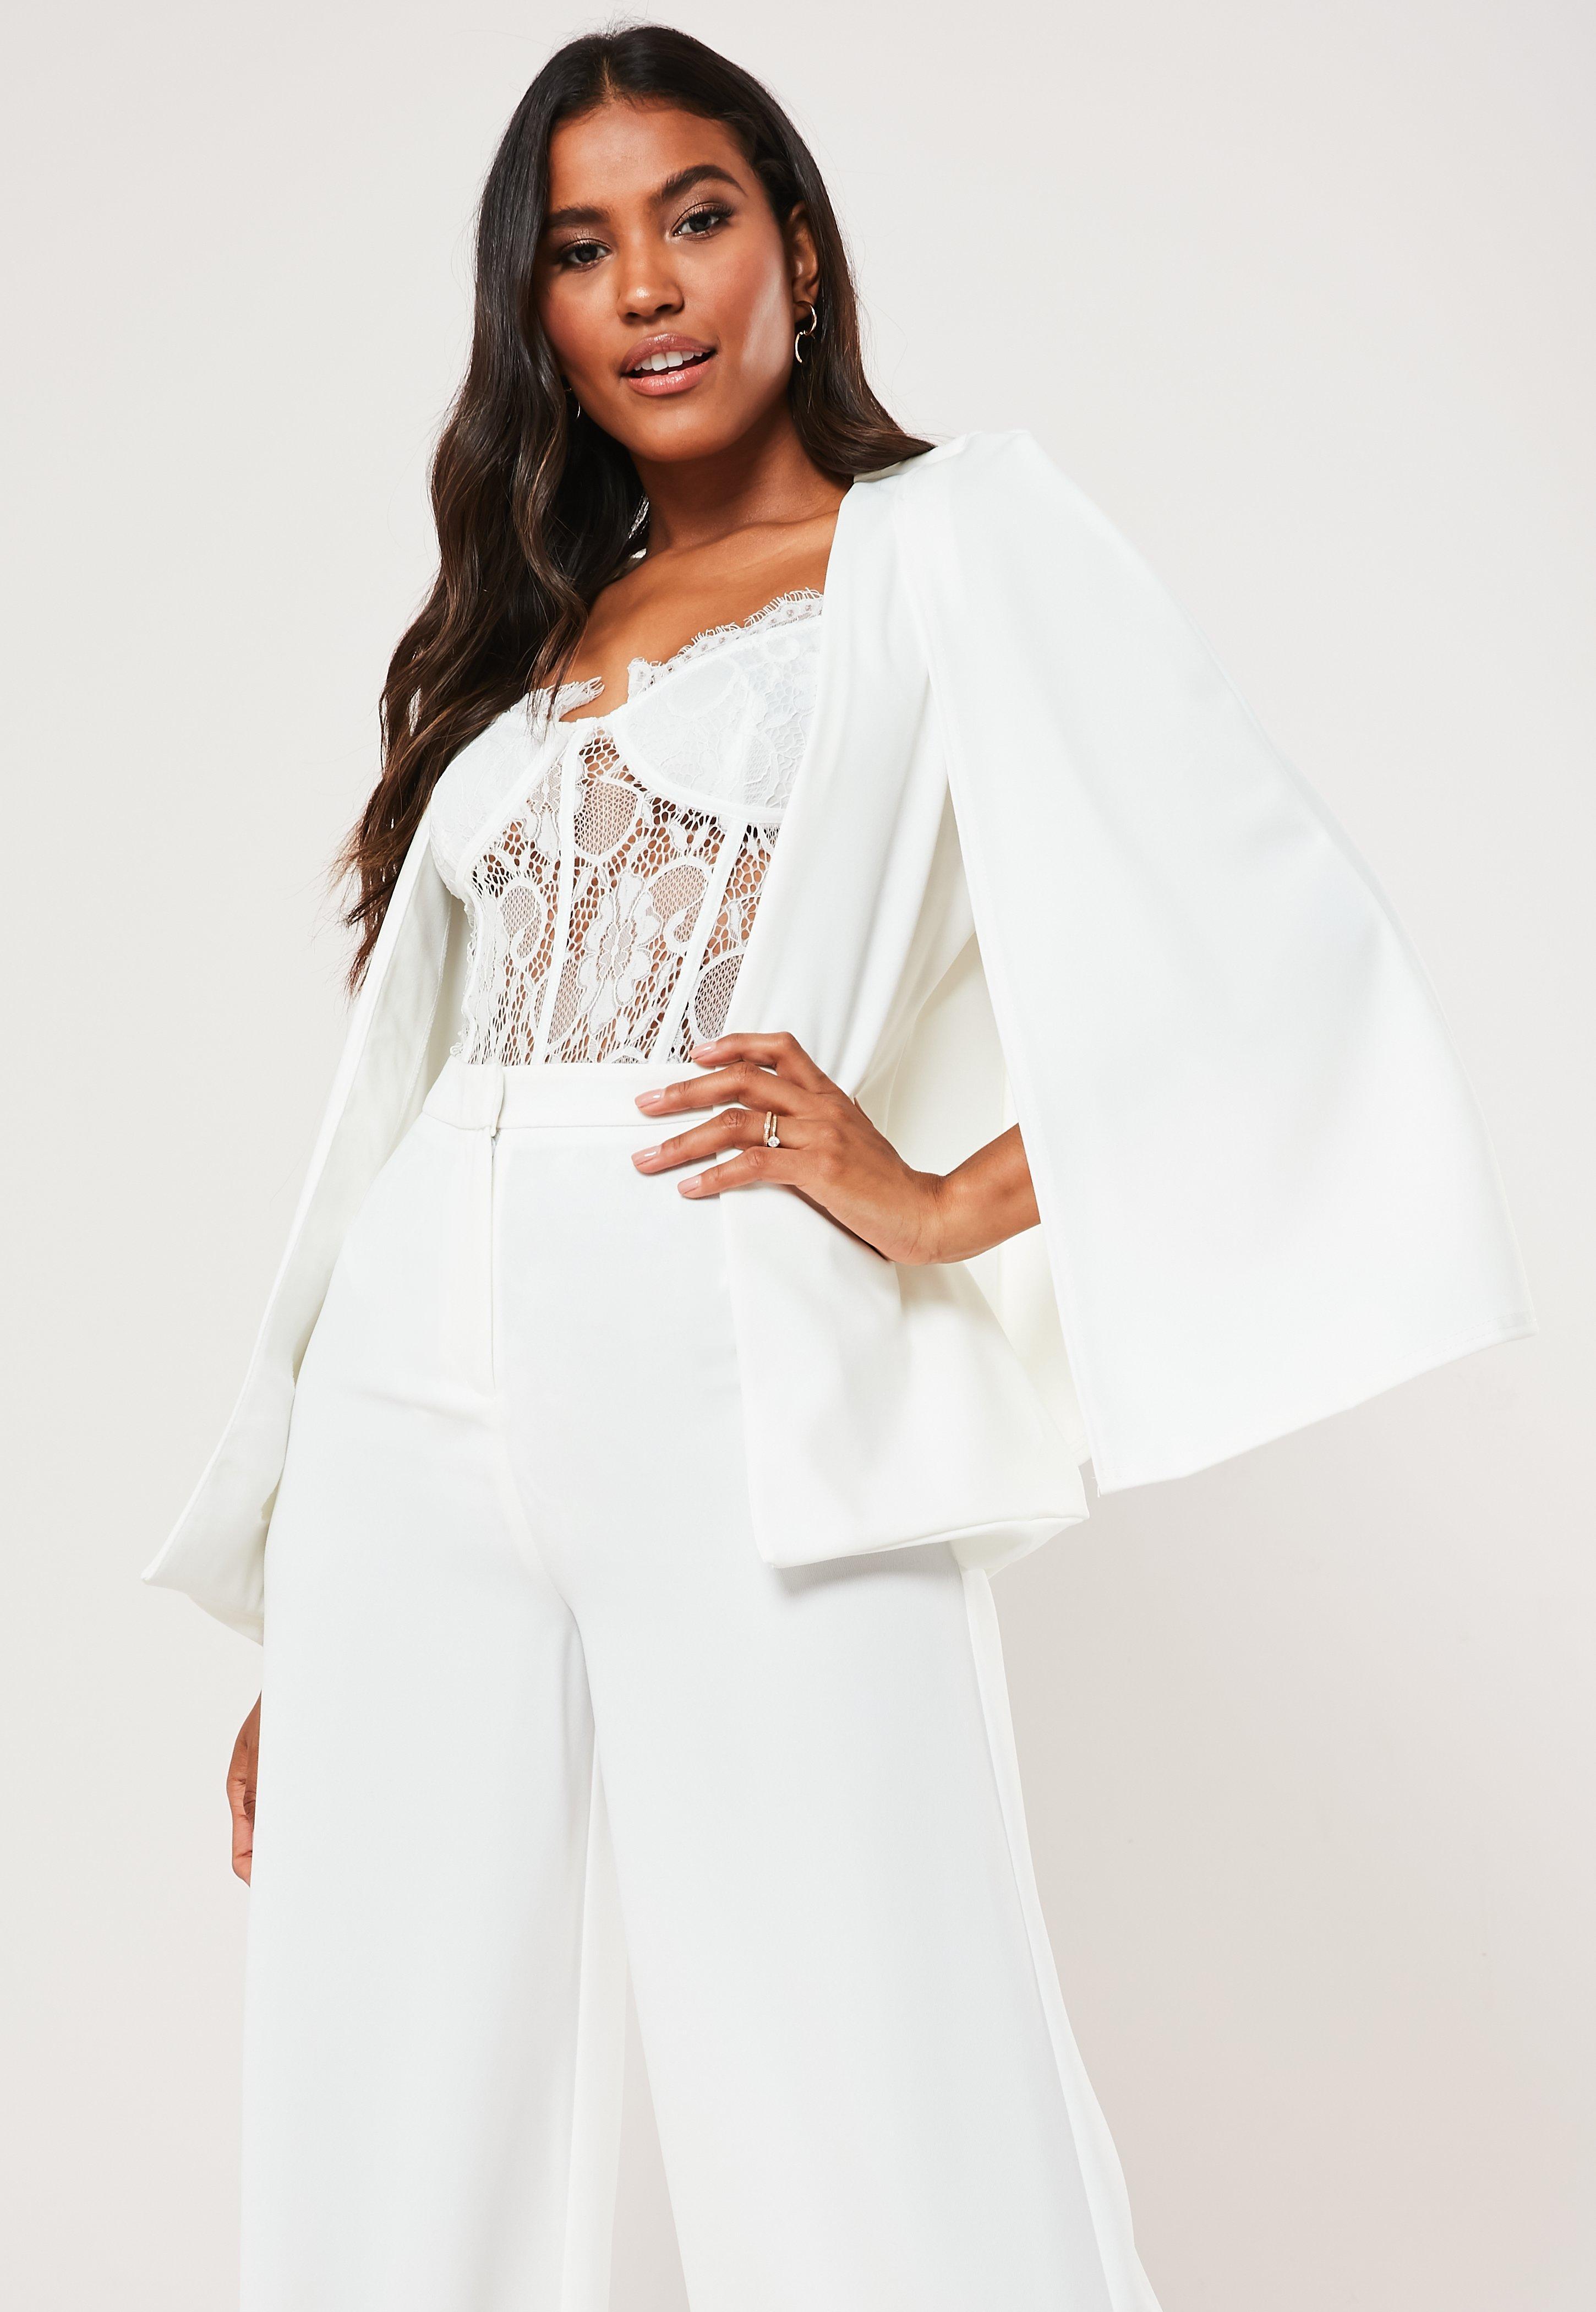 3b80d5c4b84af Blazers for Women - Shop Smart   Tweed Blazers UK - Missguided